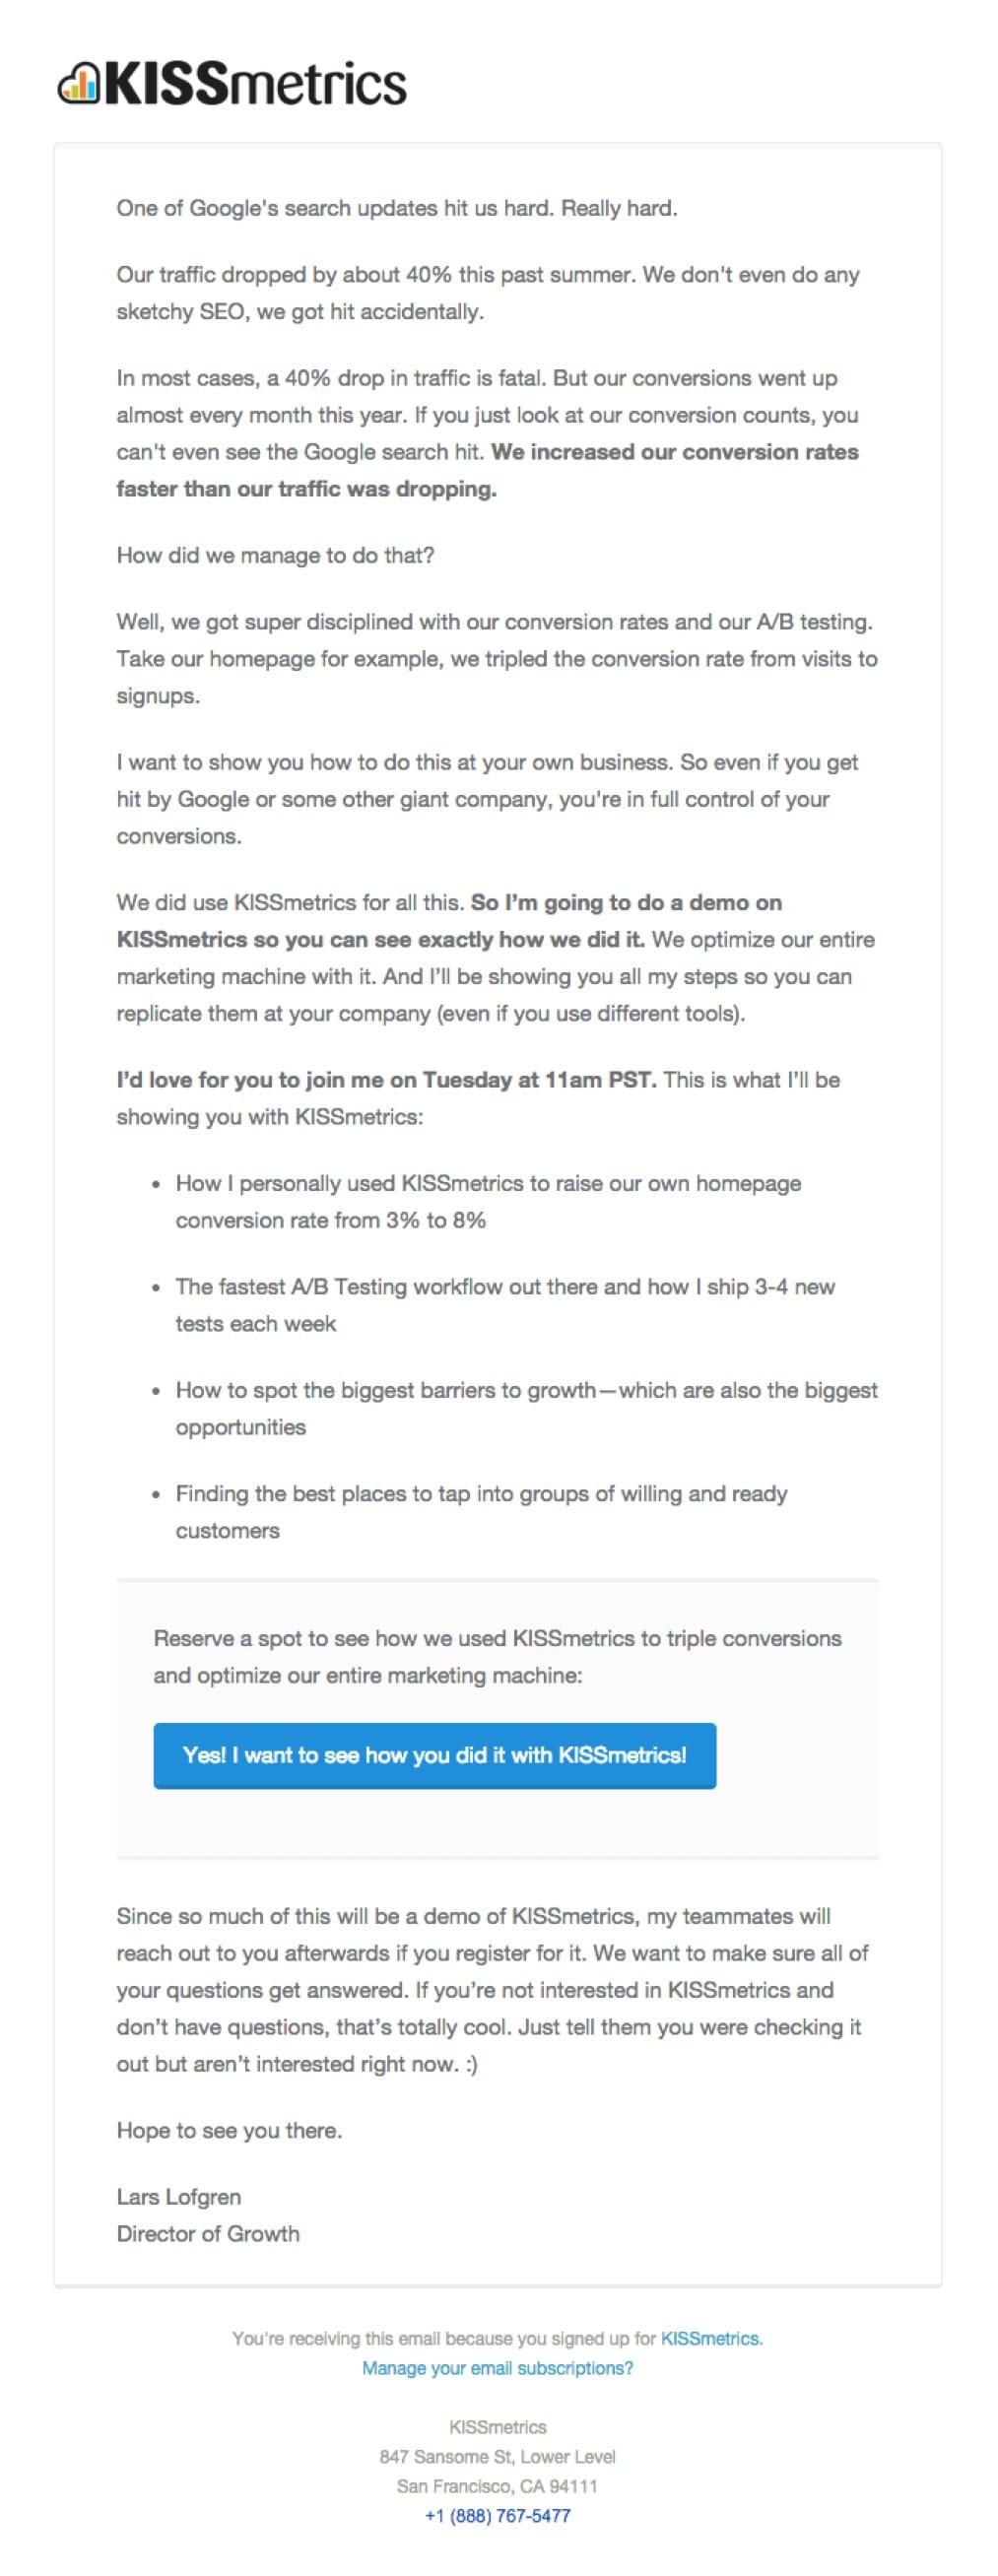 promotional email example kissmetrics (event announcement)